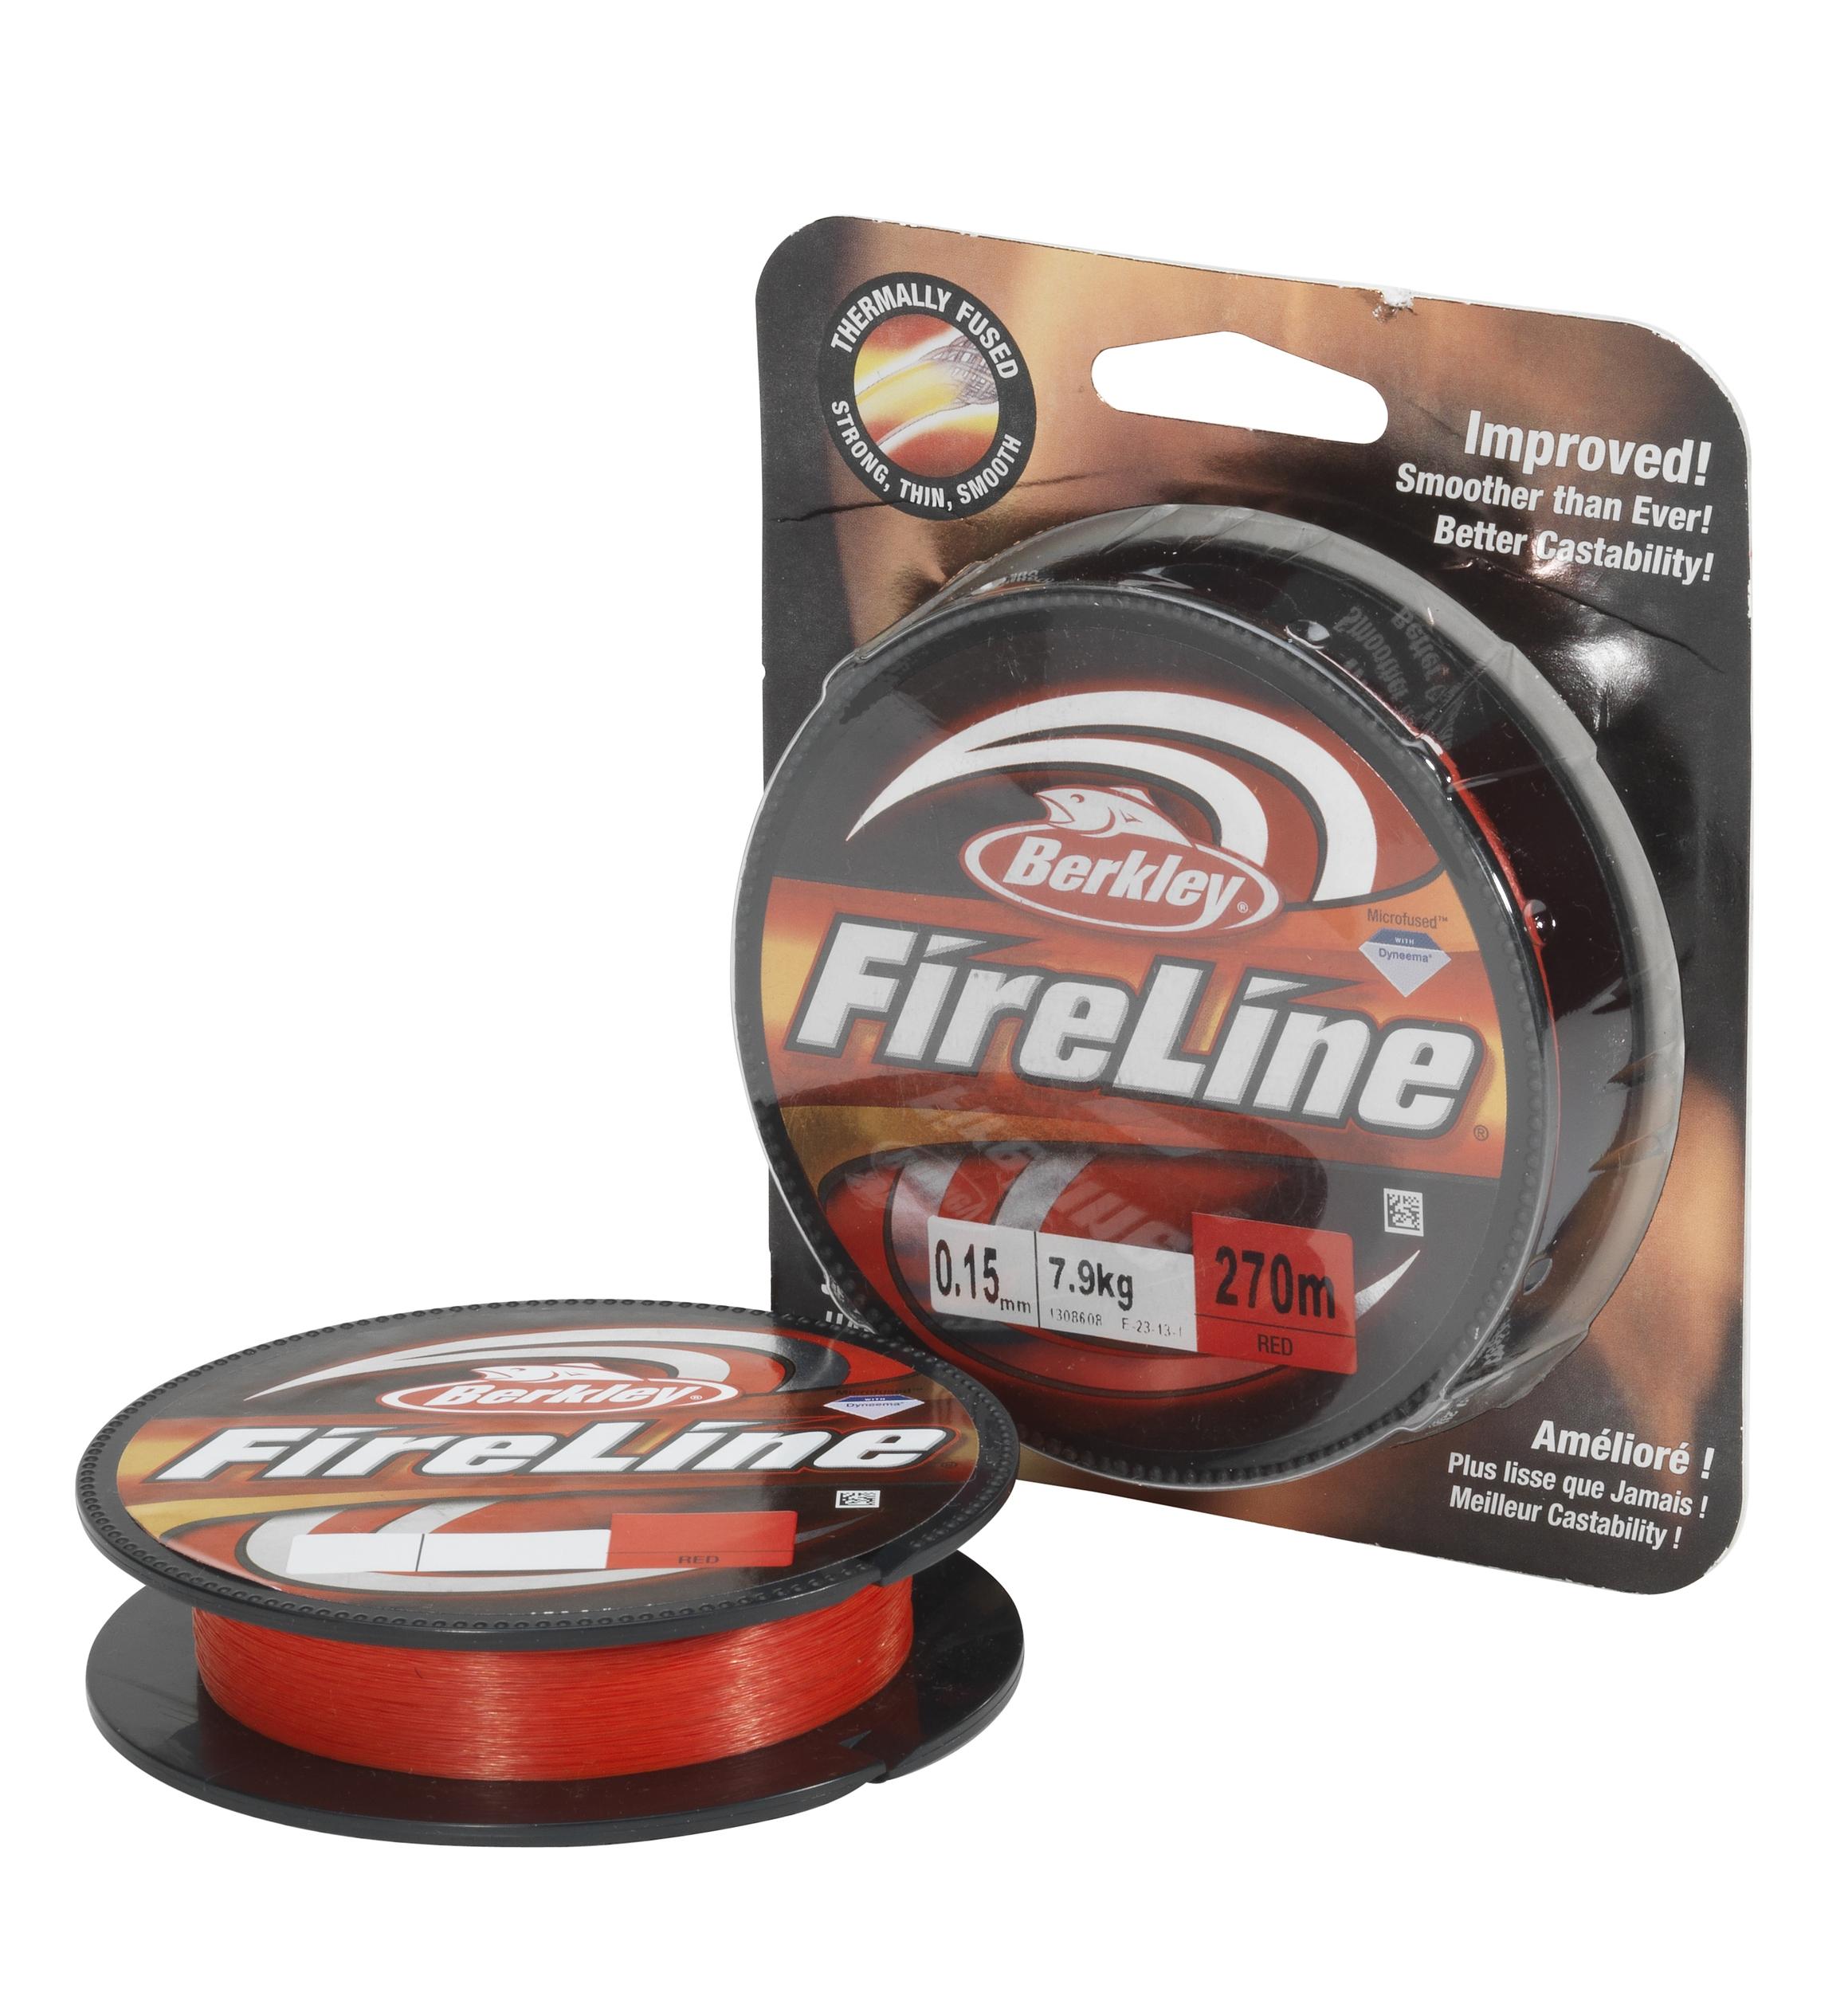 Шнур Berkley FireLine EFLNFS15-RD красный  110m 0.15mm 7.9kg